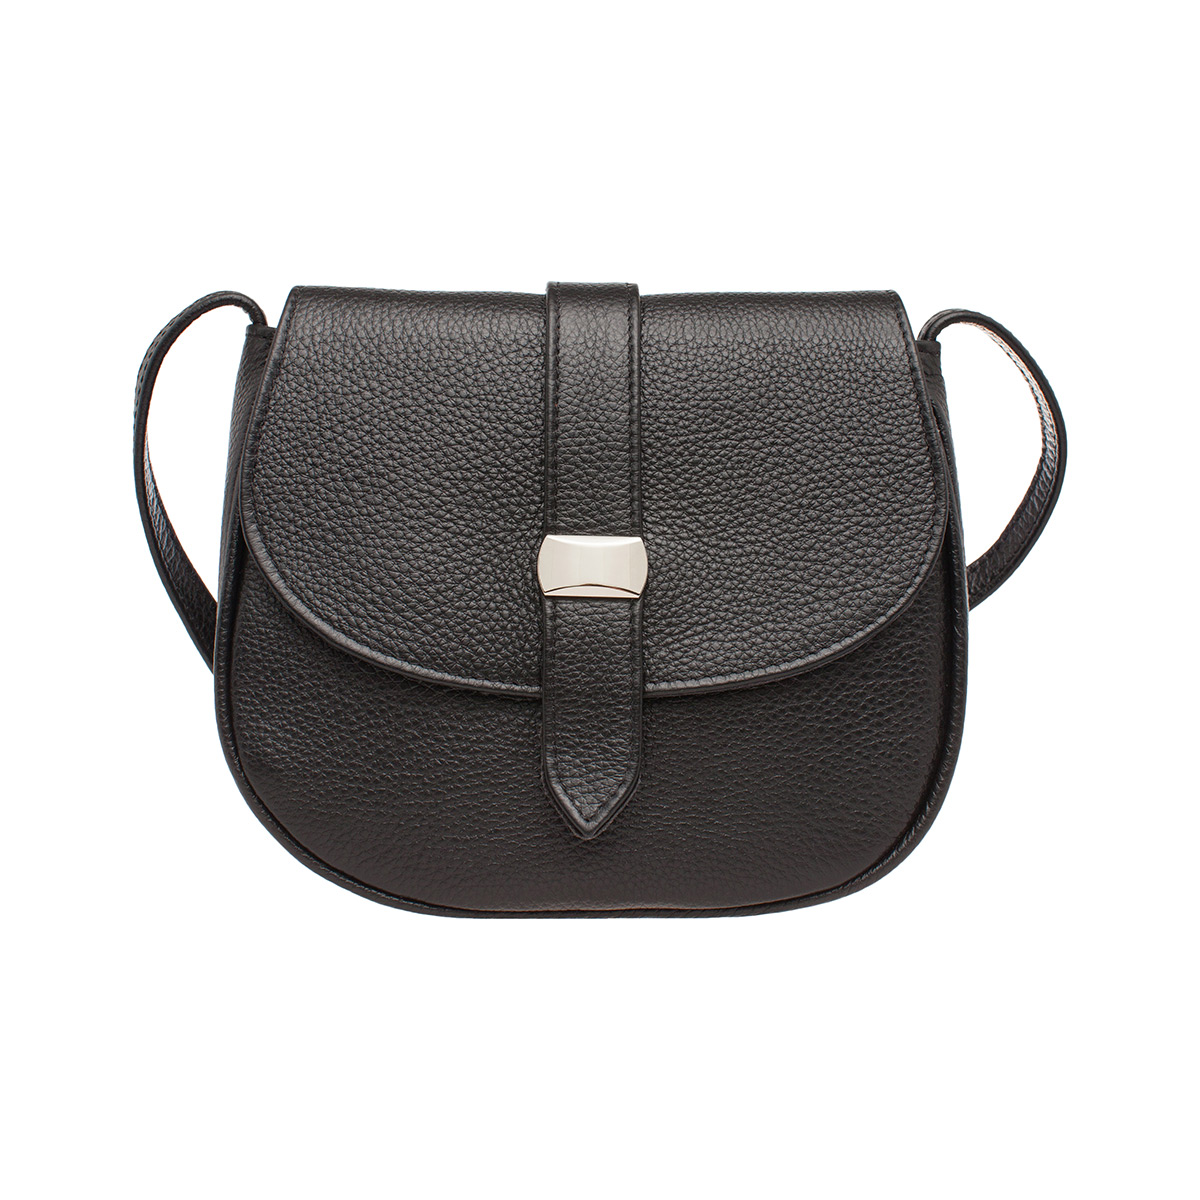 Женская сумка через плечо Baglyn Black фото